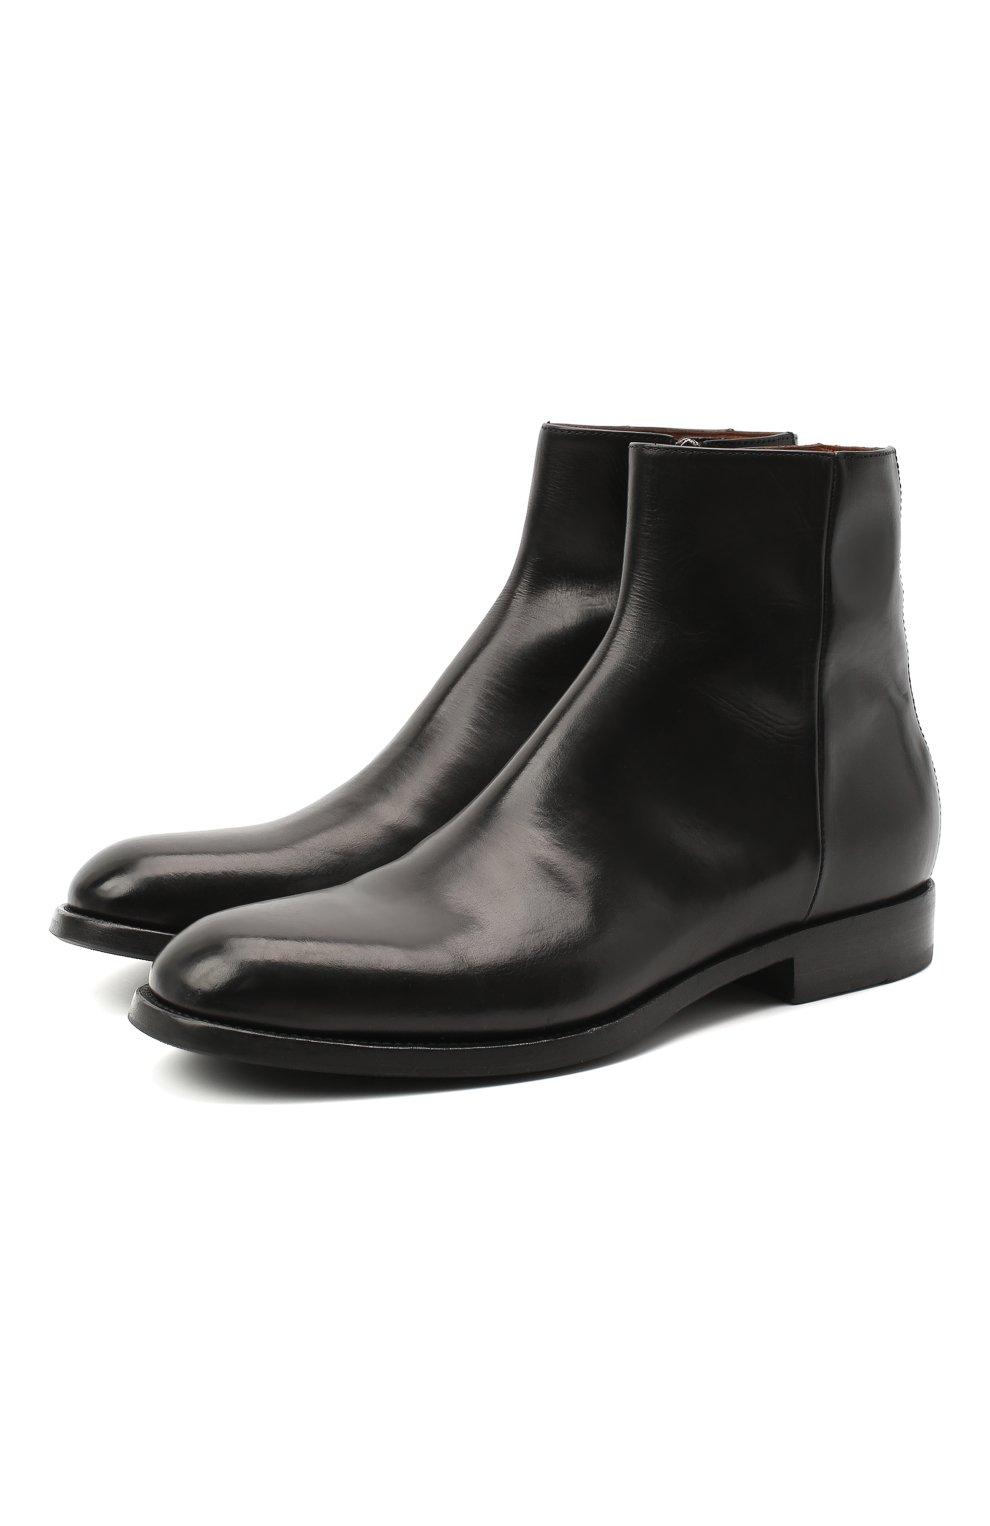 Мужские кожаные сапоги PANTANETTI черного цвета, арт. 14020E | Фото 1